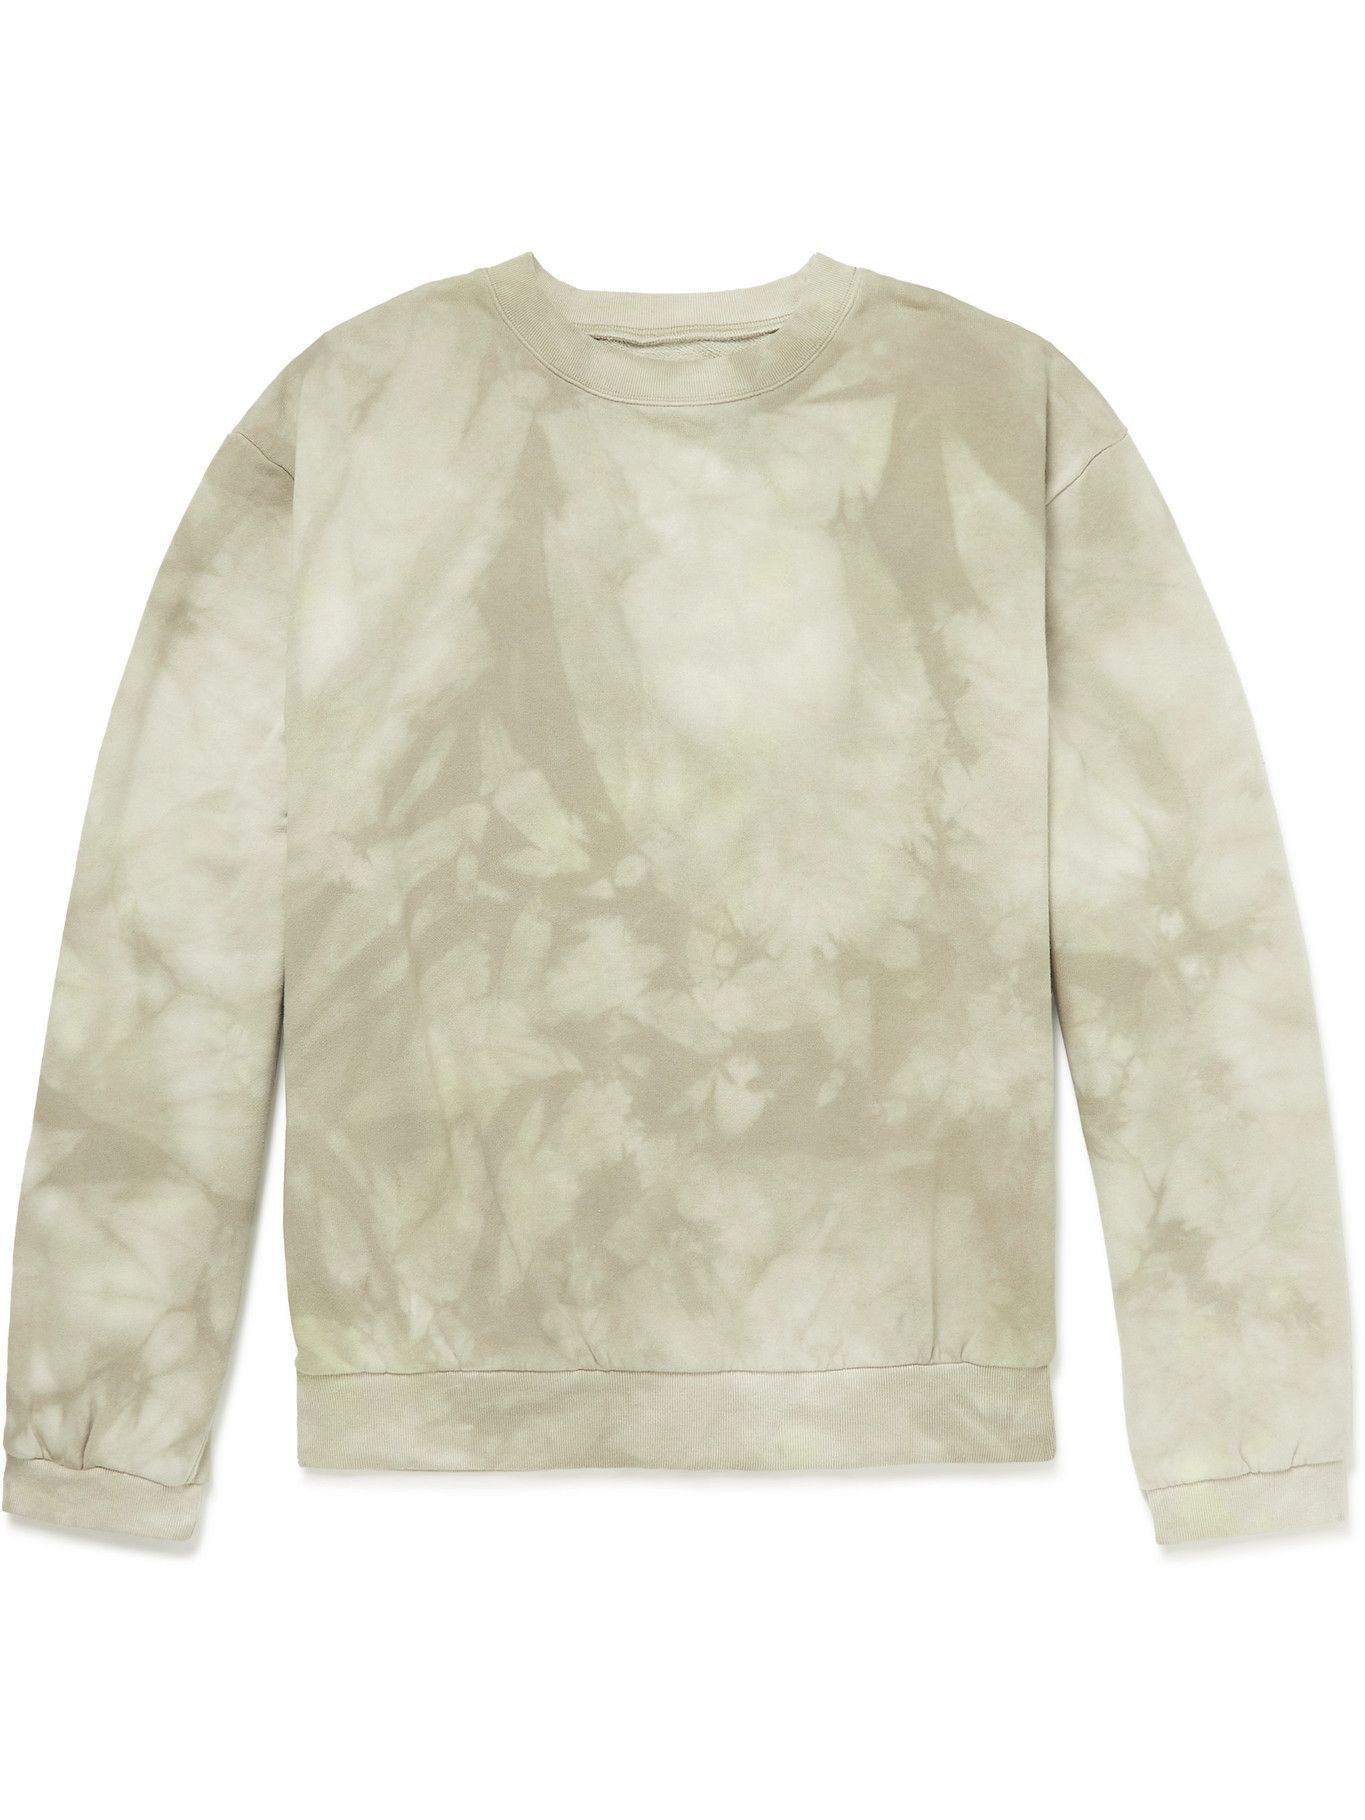 Photo: KAPITAL - Tie-Dyed Cotton-Jersey Sweatshirt - Neutrals